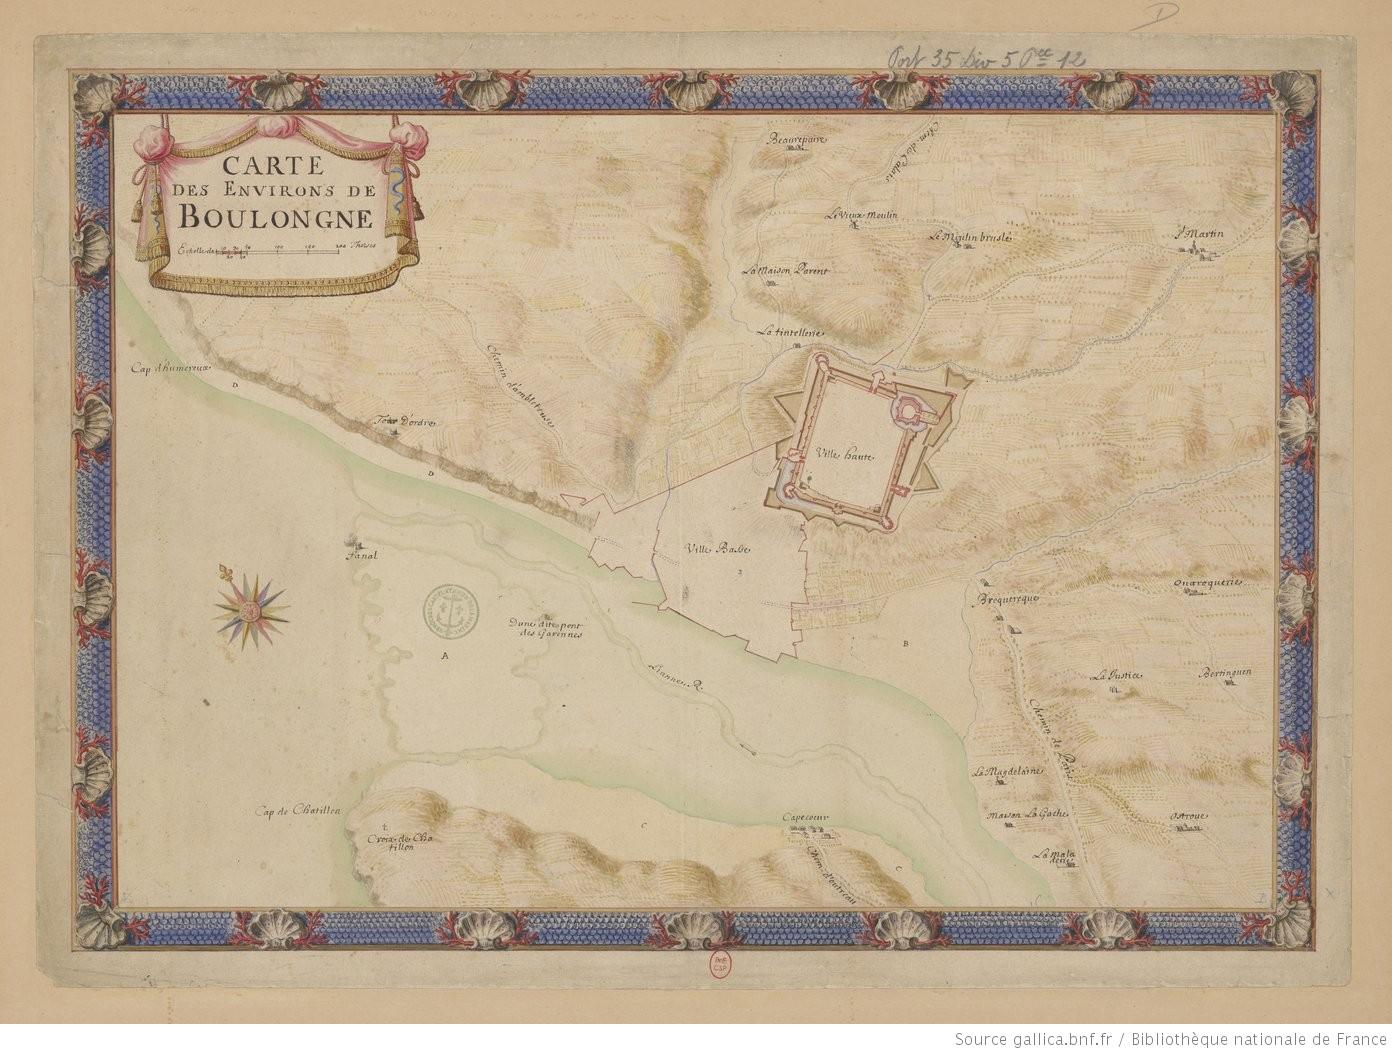 http://gallica.bnf.fr/ark:/12148/btv1b530110911/f1.highres